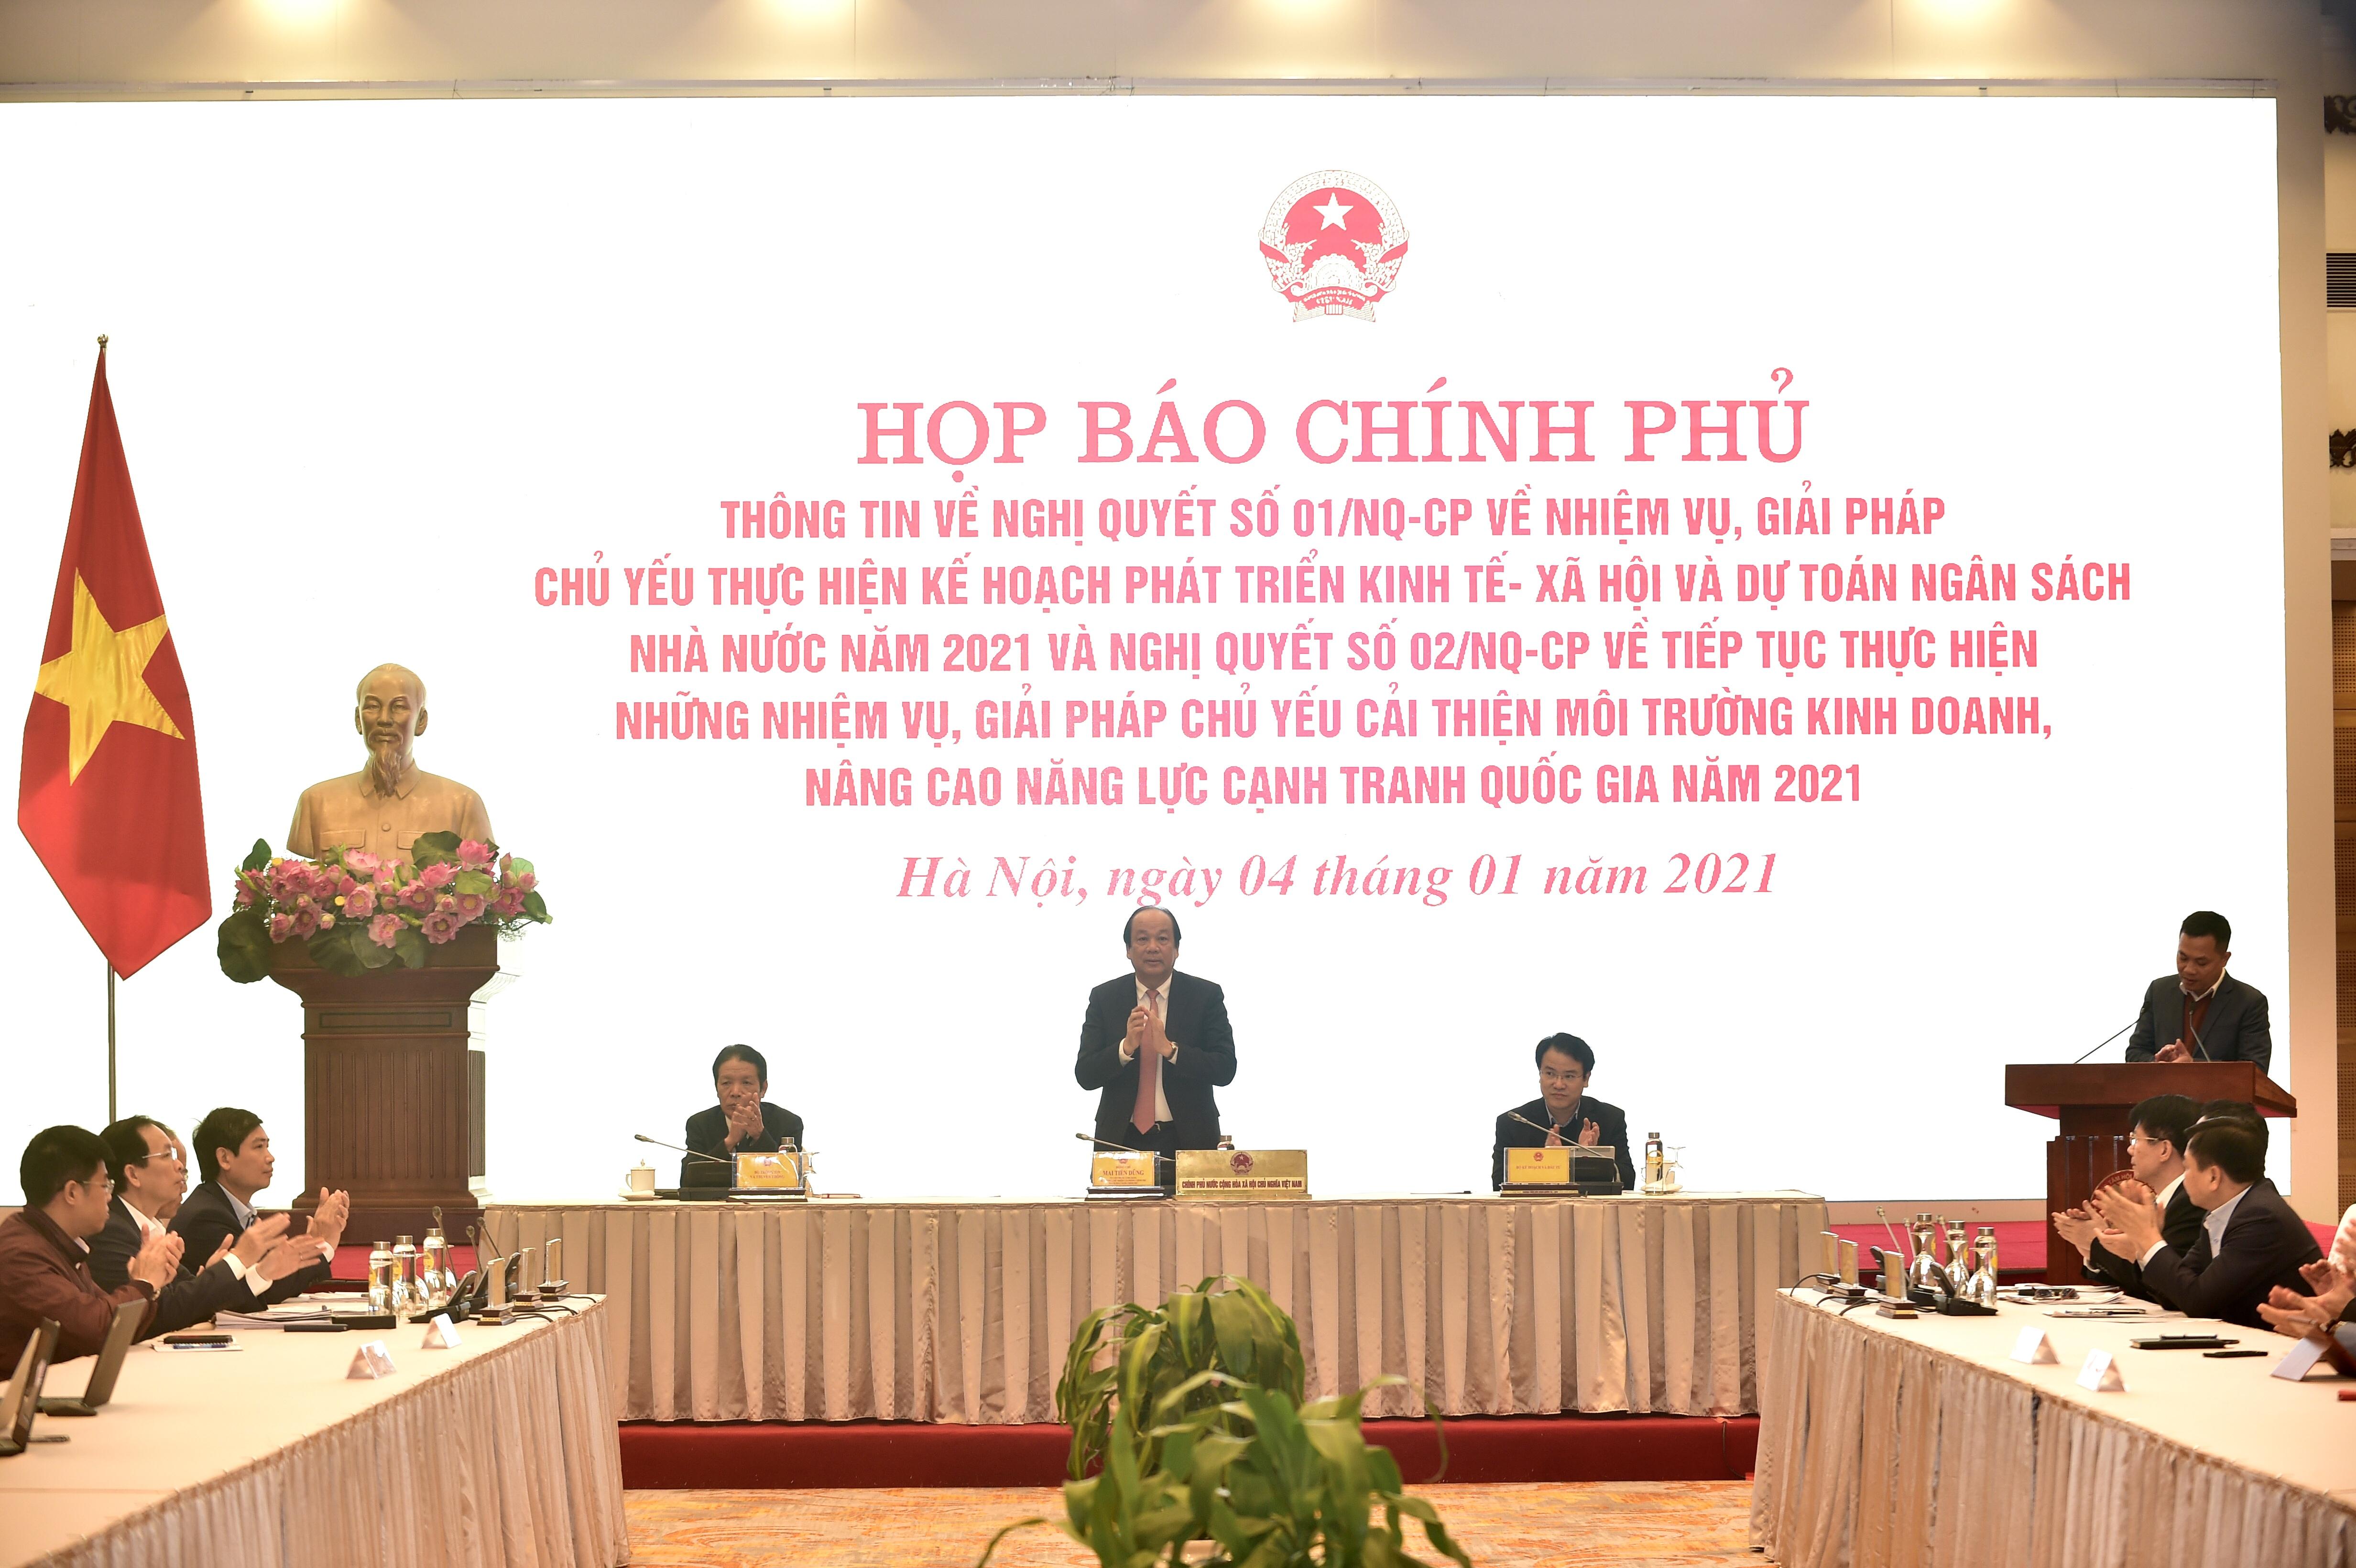 hop bao thong tin ve nghi quyet 01 02 cua chinh phu